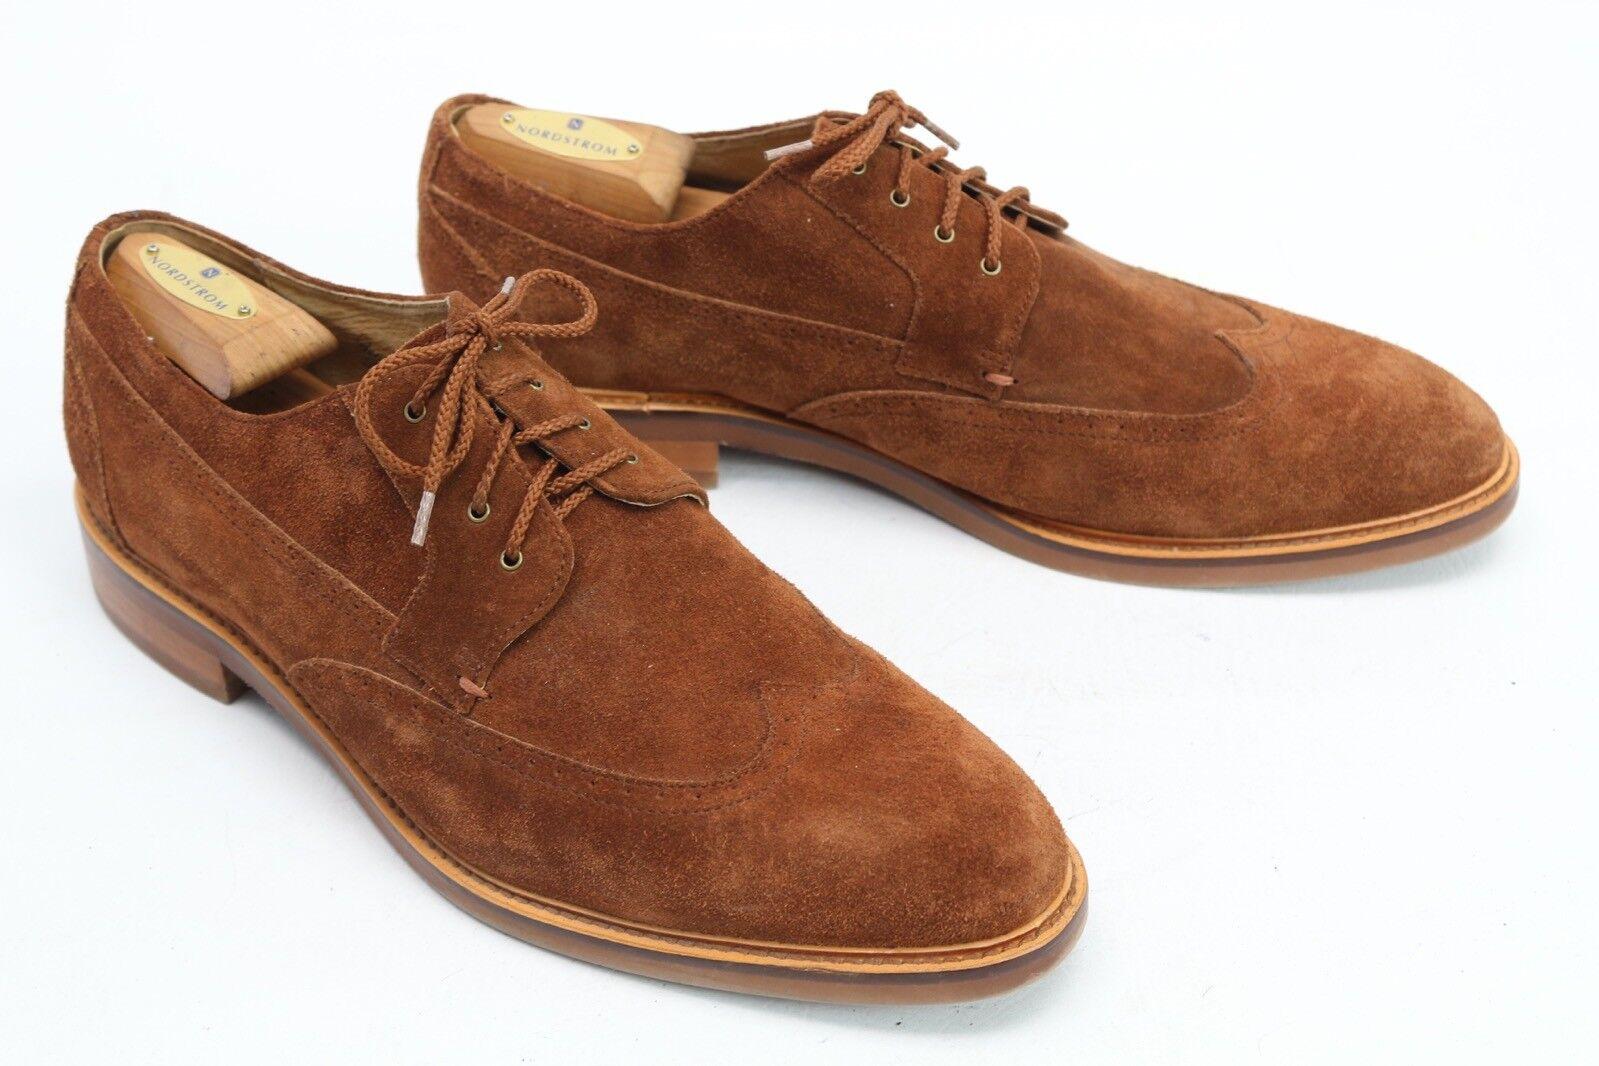 Joseph Abboud Herren Kleid Schuhe 11.5 Braunes Wildleder Wingtip Blücher Gummi